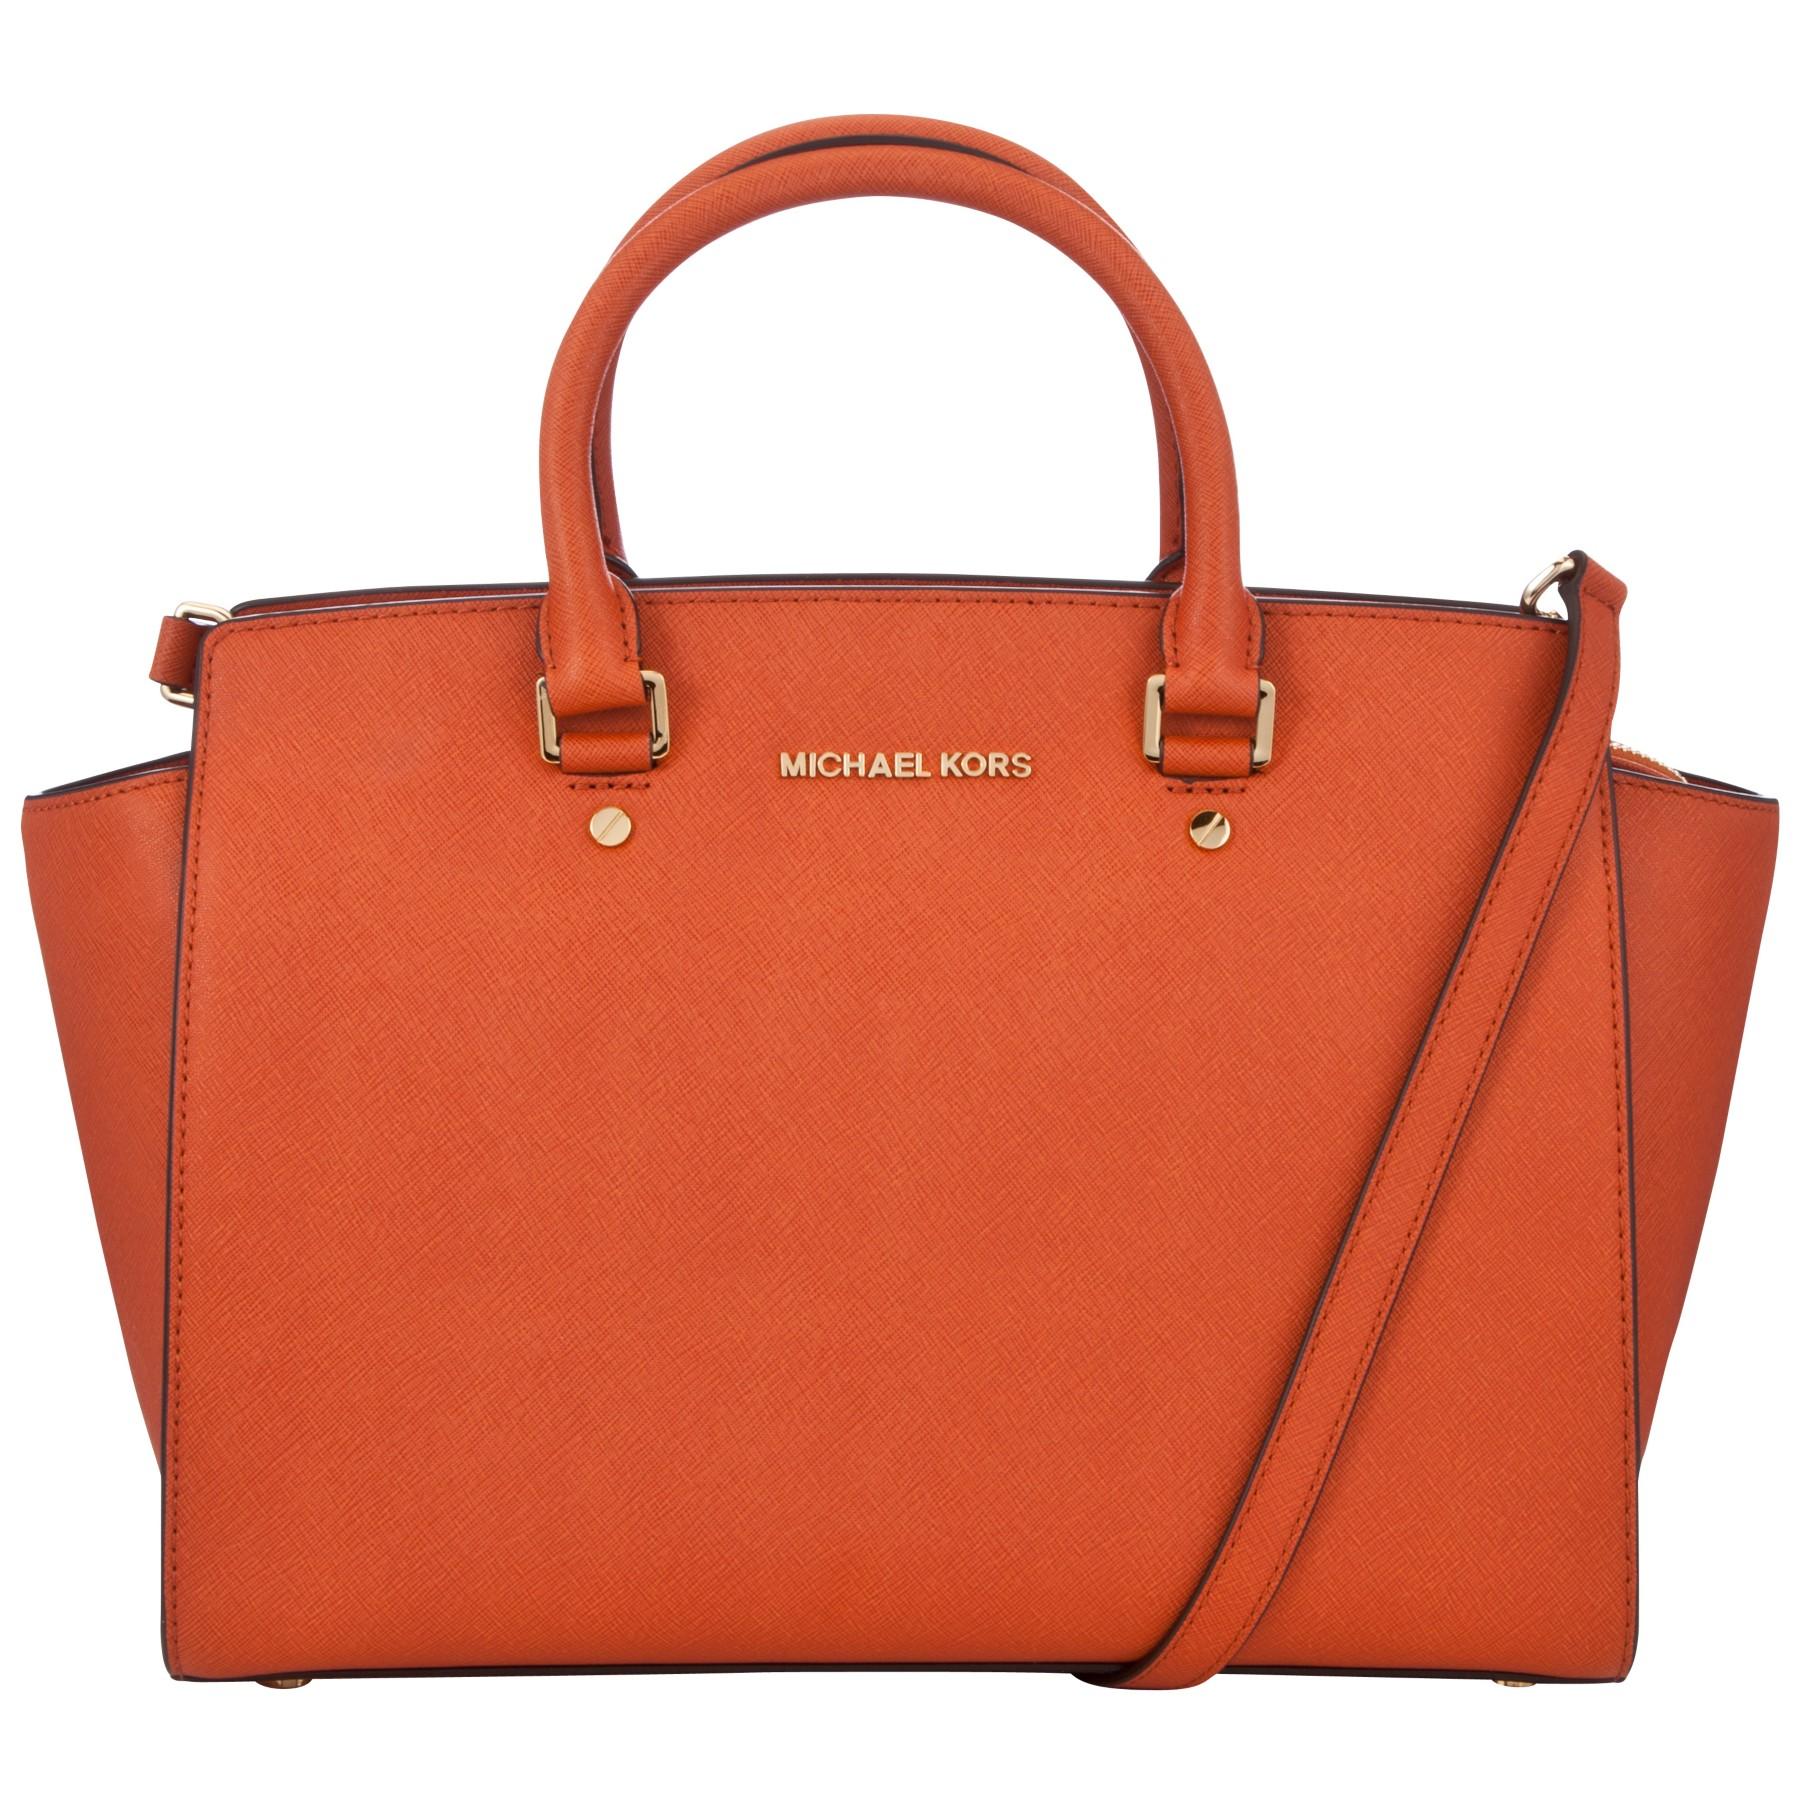 michael michael kors selma large tote handbag in orange lyst. Black Bedroom Furniture Sets. Home Design Ideas